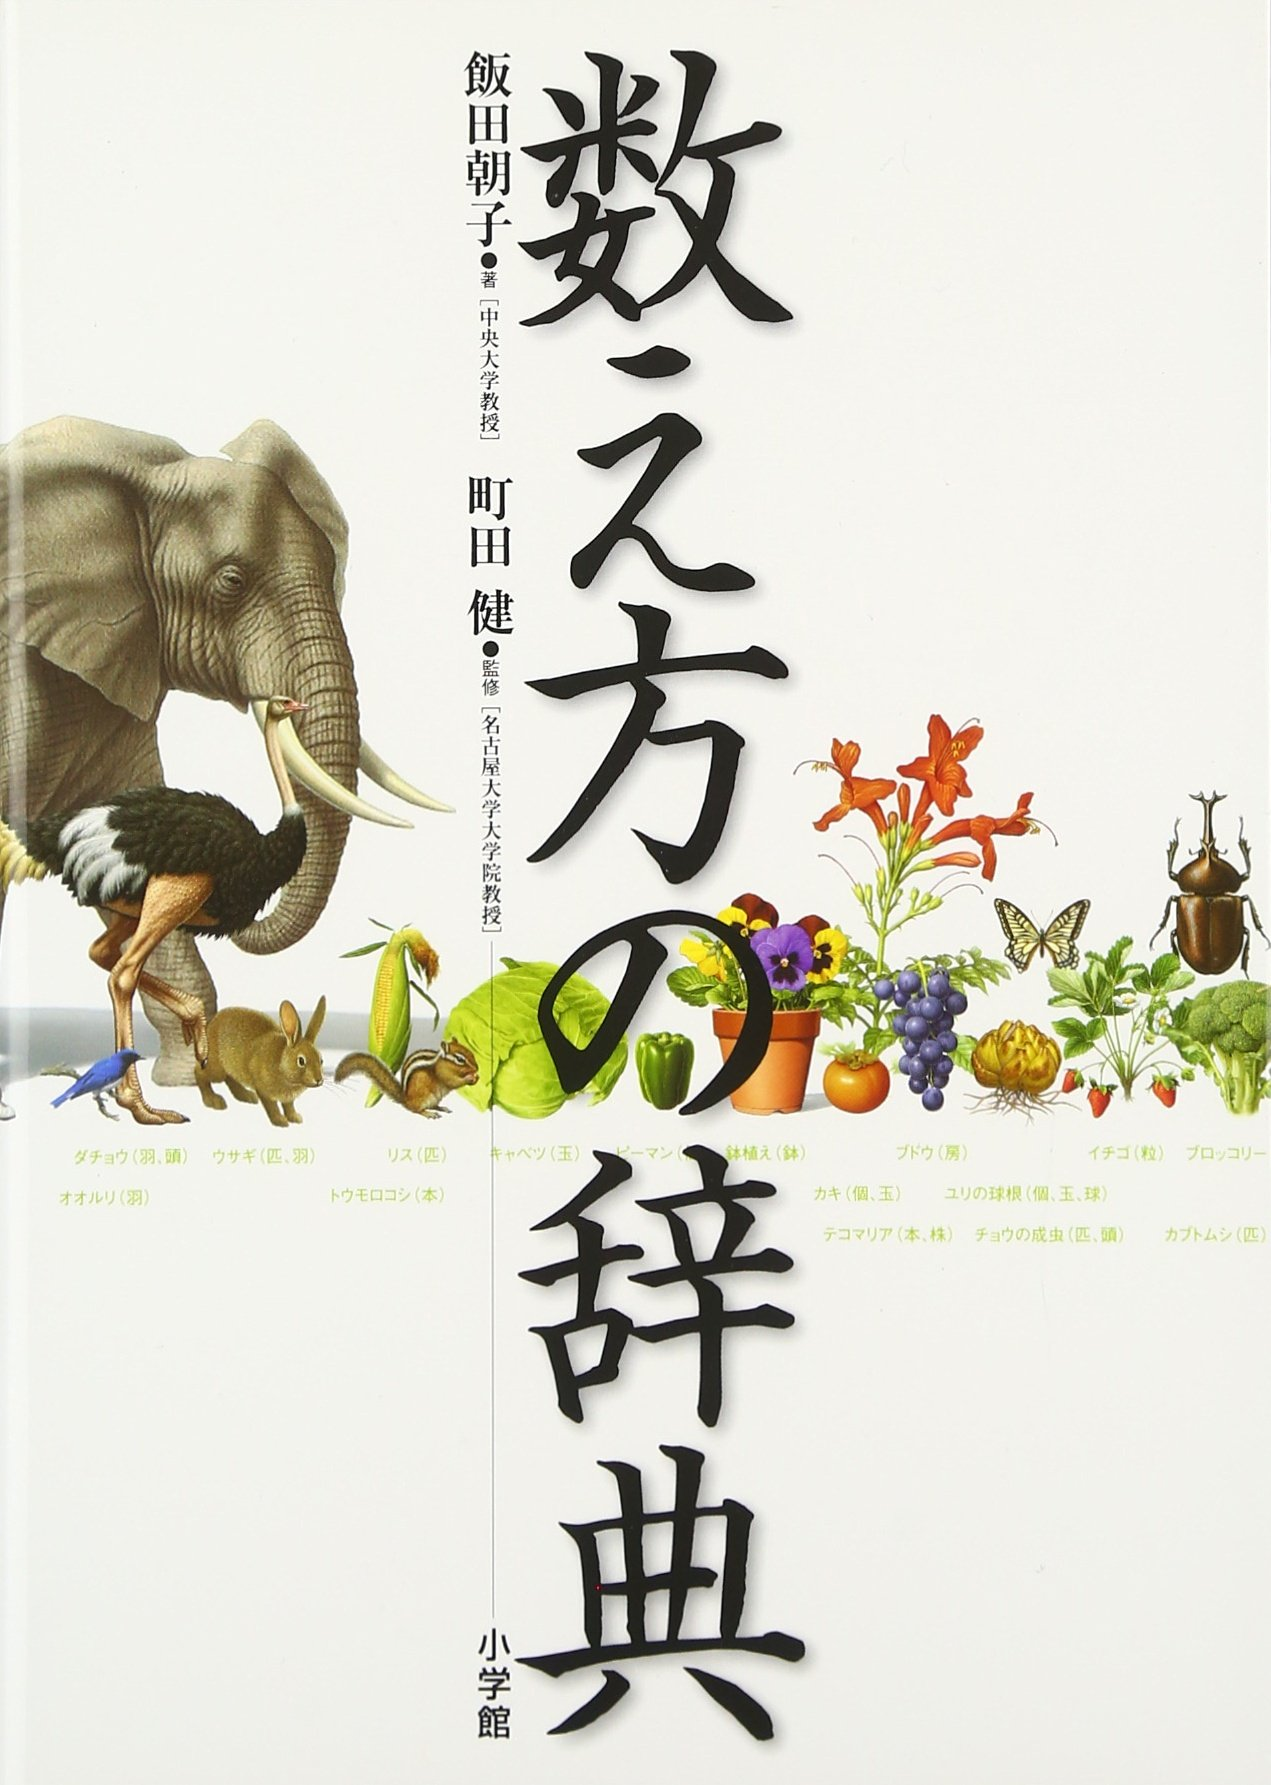 Kazoekata No Jiten - Japanese Language Counting Dictionary by Shogakkan